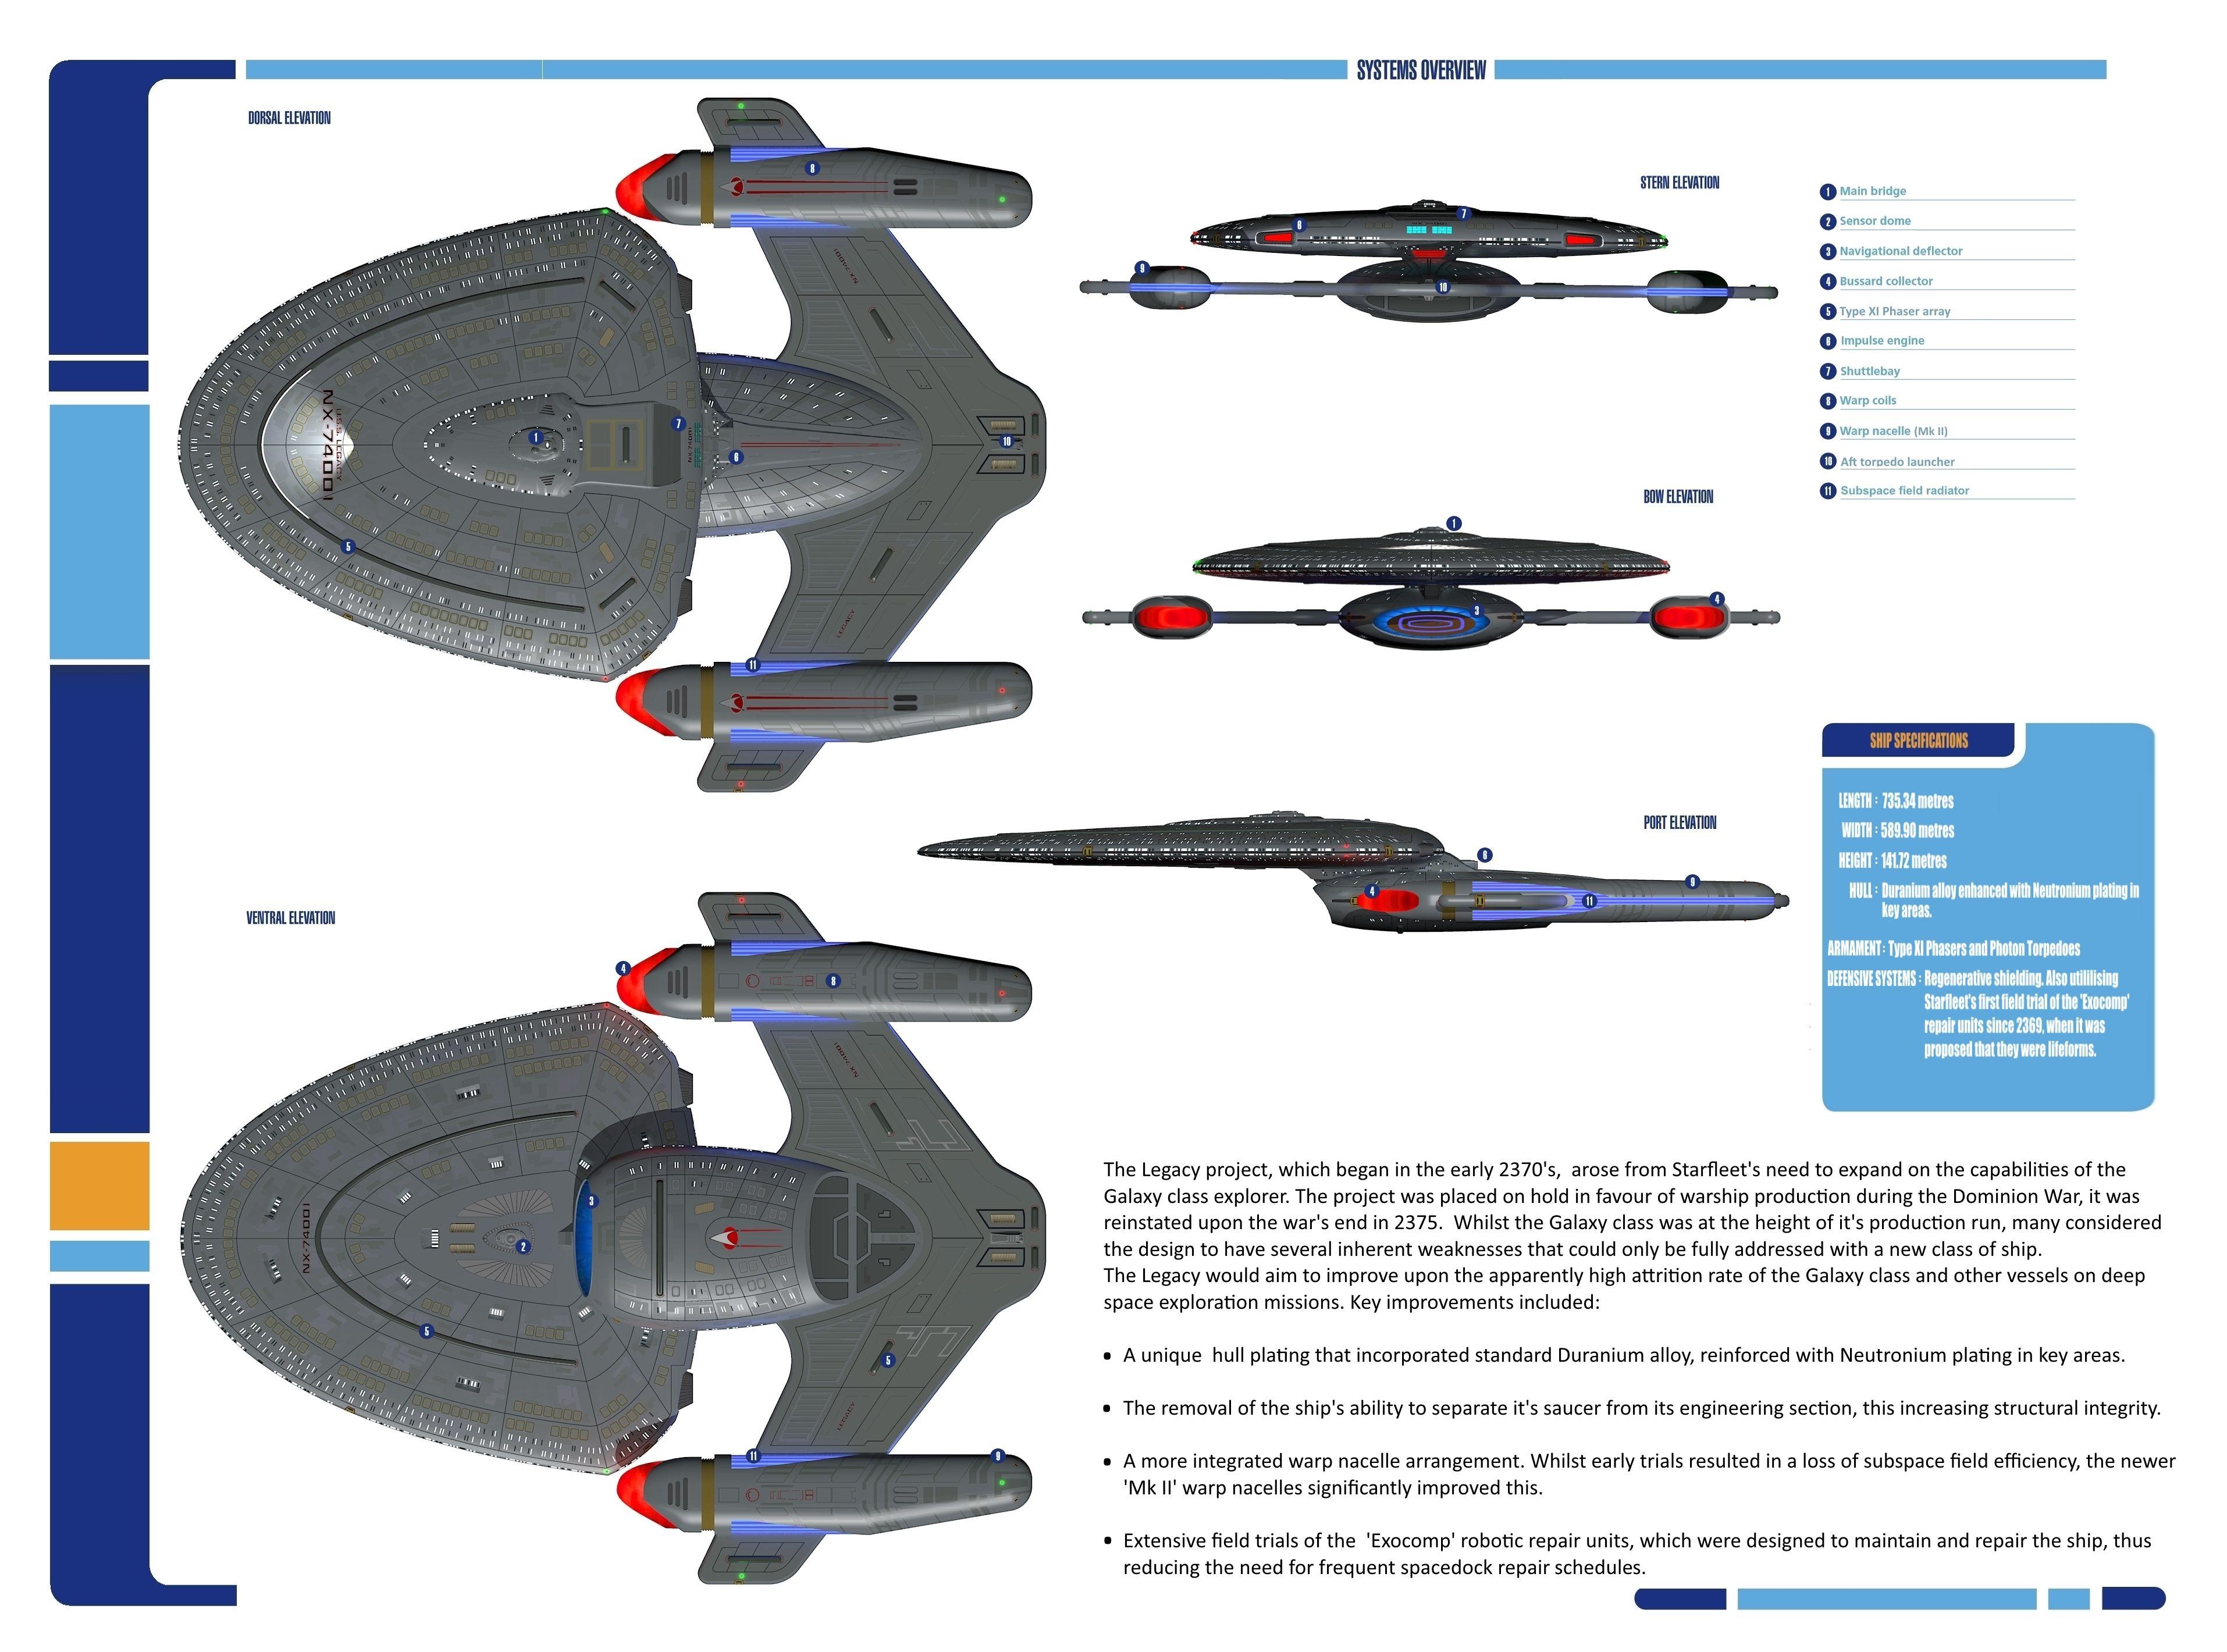 U S S Legacy Spec Sheet Haynes Manual Style Star Trek Starships Star Trek Ships Star Trek Images